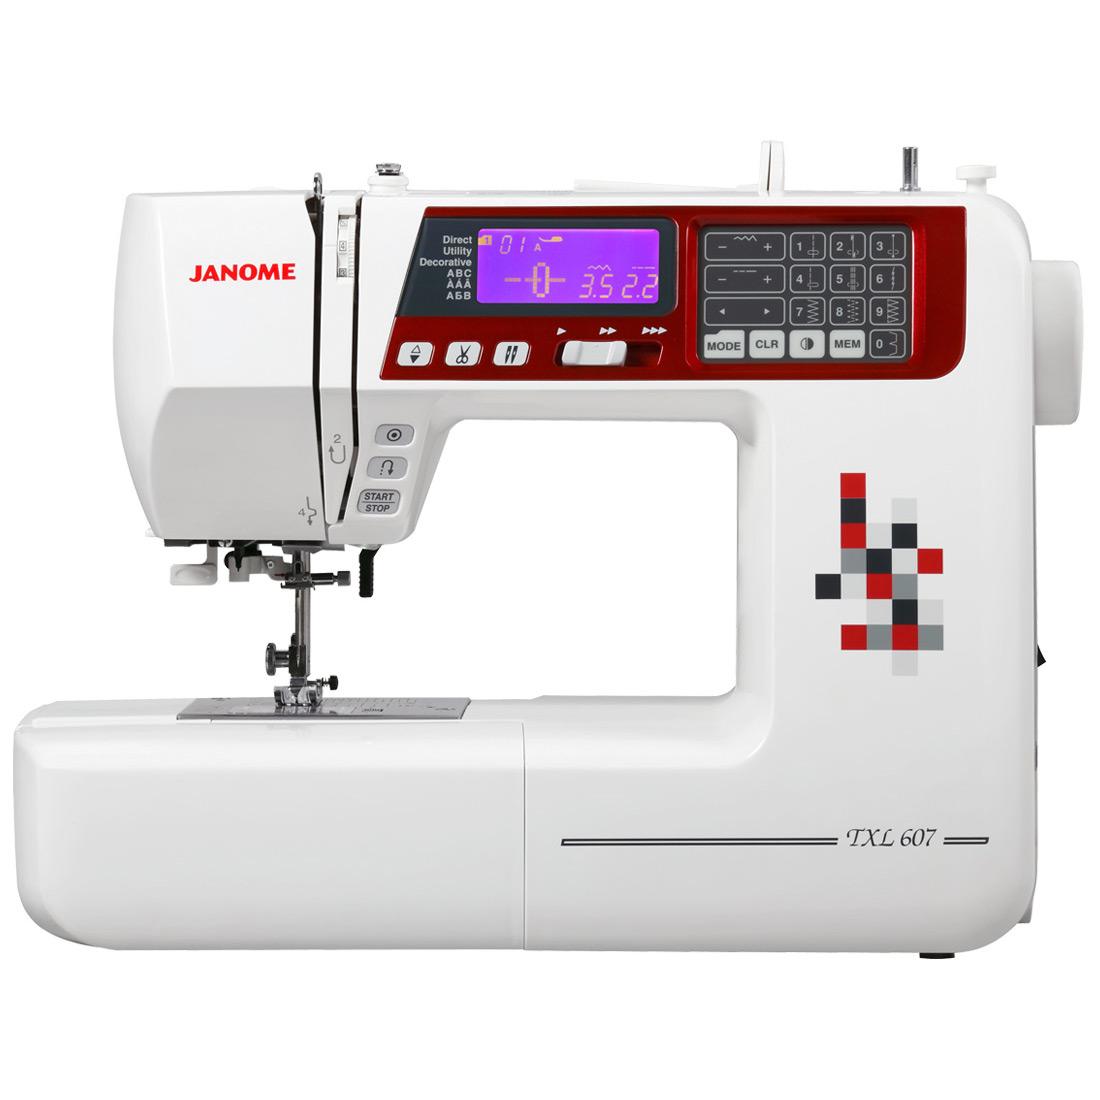 Multifunktionelle, computergesteuerte Nähmaschine - JANOME TXL607